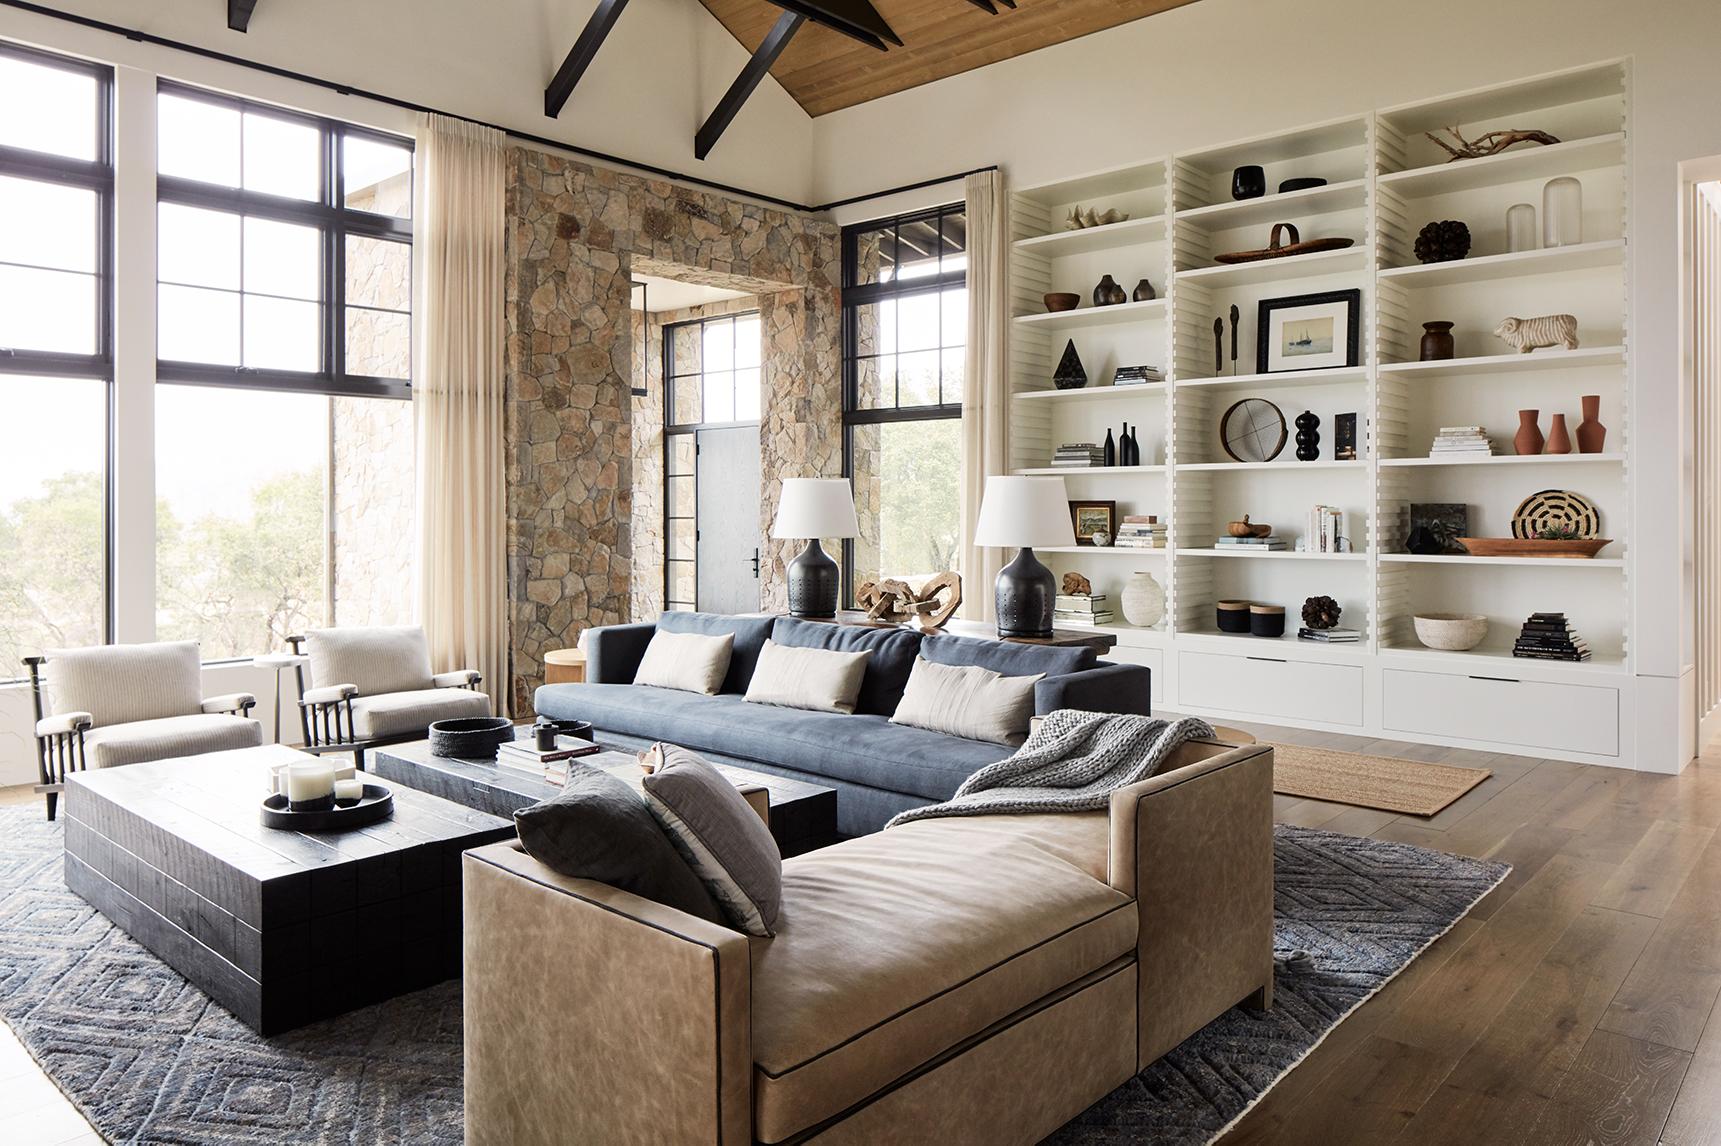 Jennifer_robins_interiors_projects_calistoga_JRI.MtnHomeRanch_003_living_room_LR